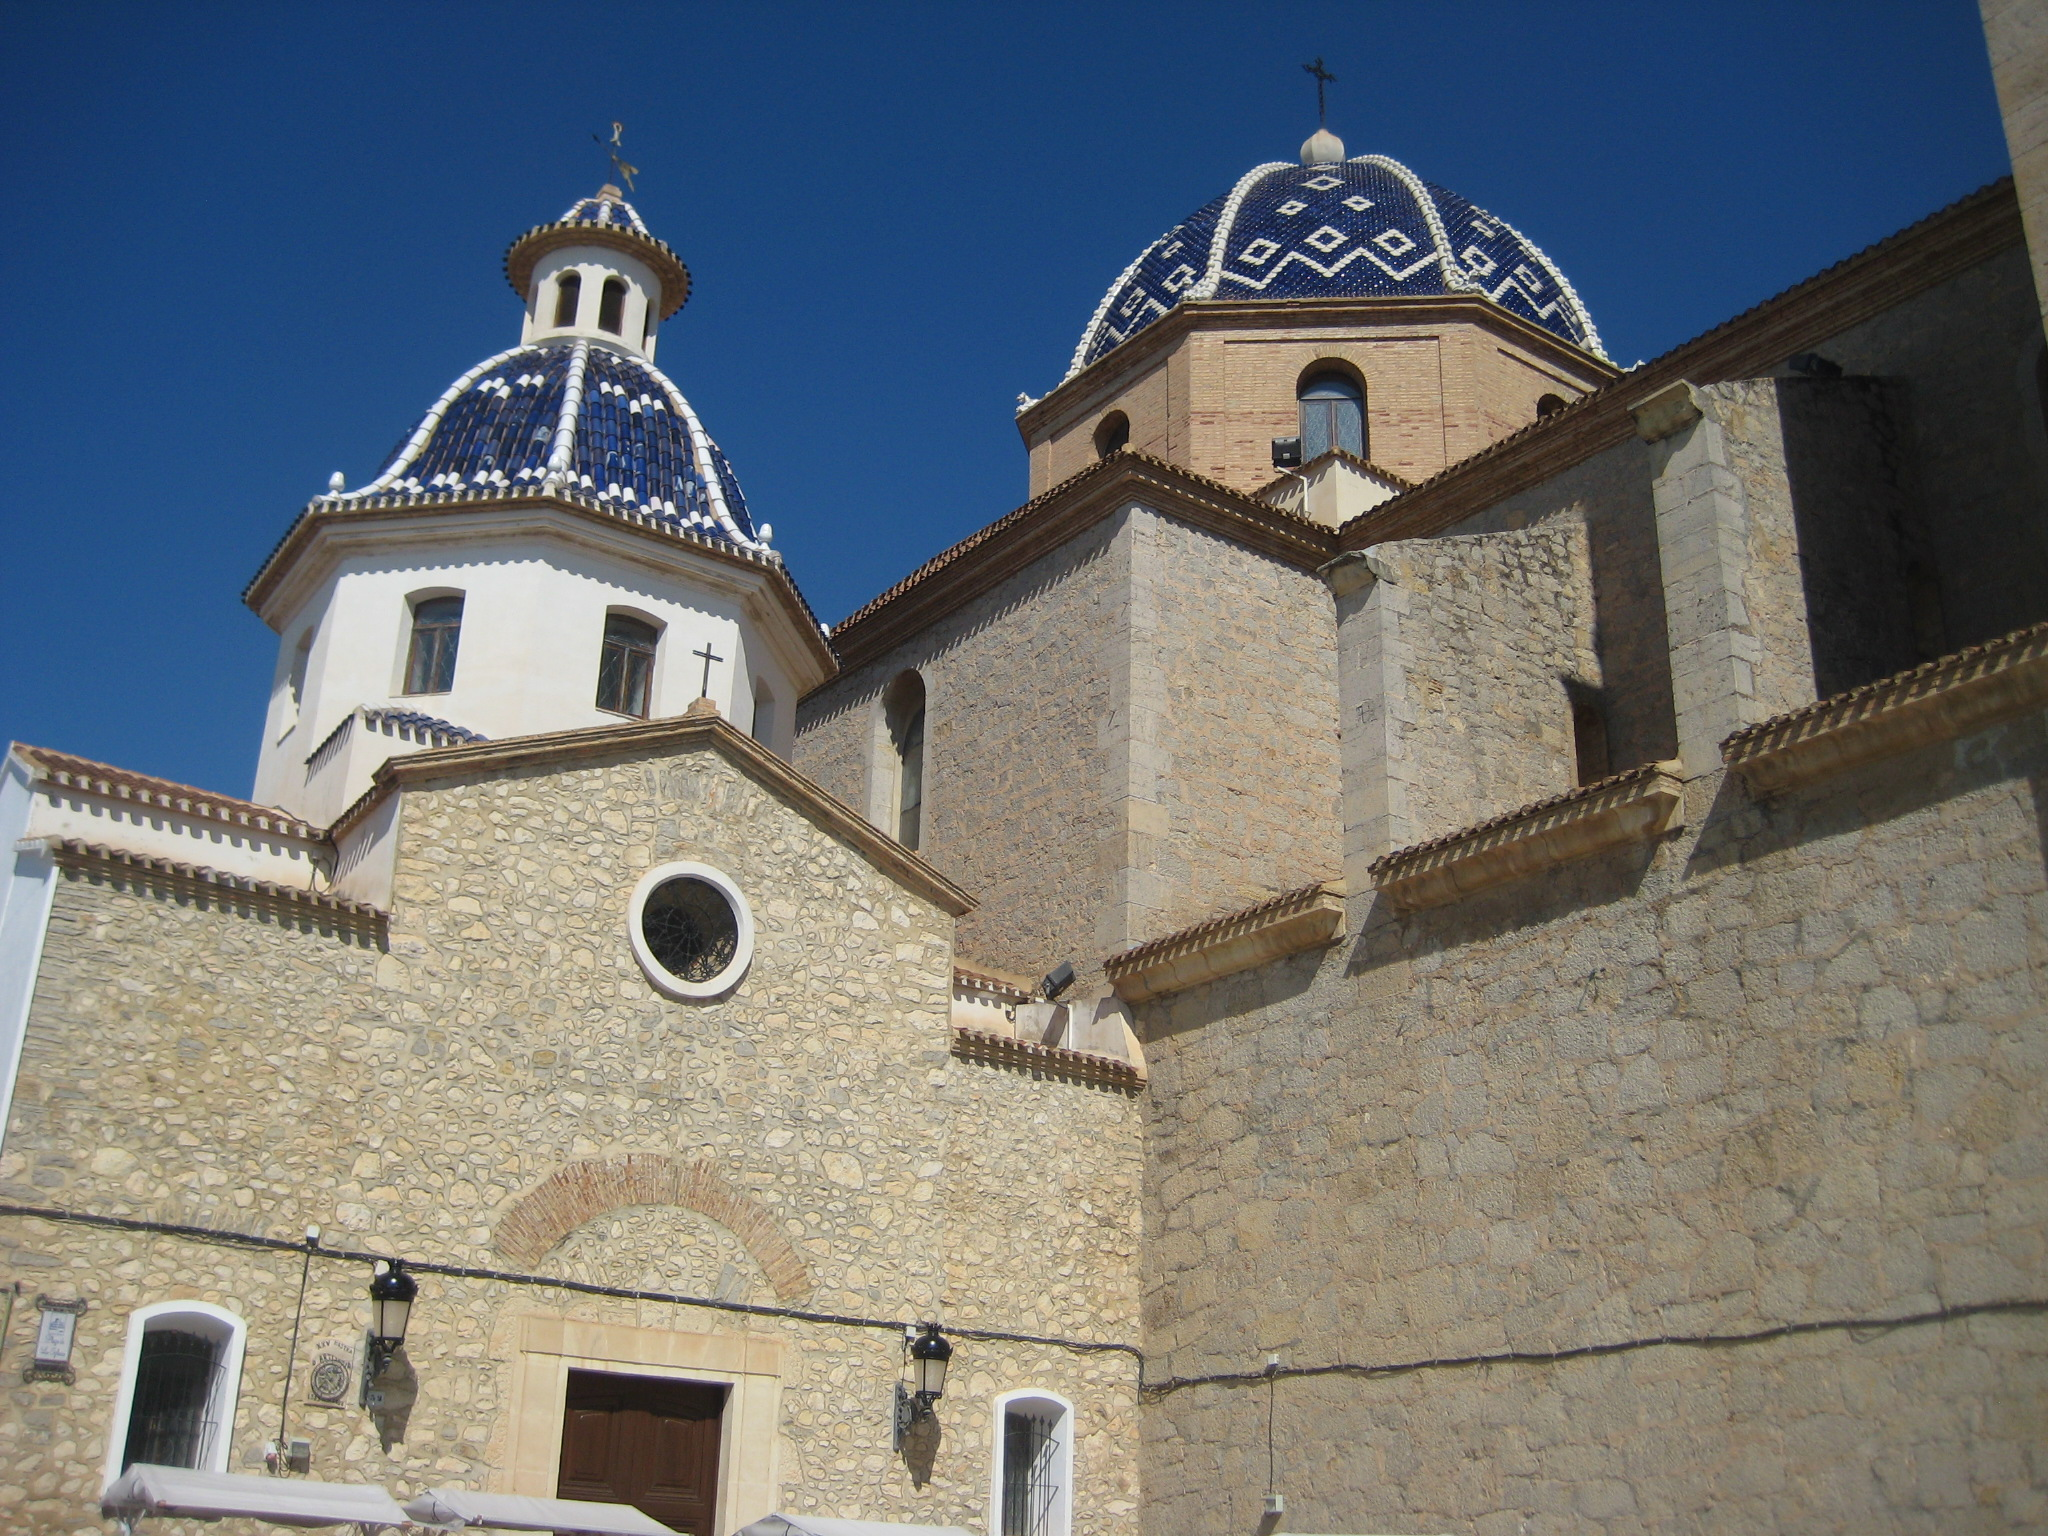 Iglesia de la Virgen de la Consolacion de Altea. Viajar a Altea